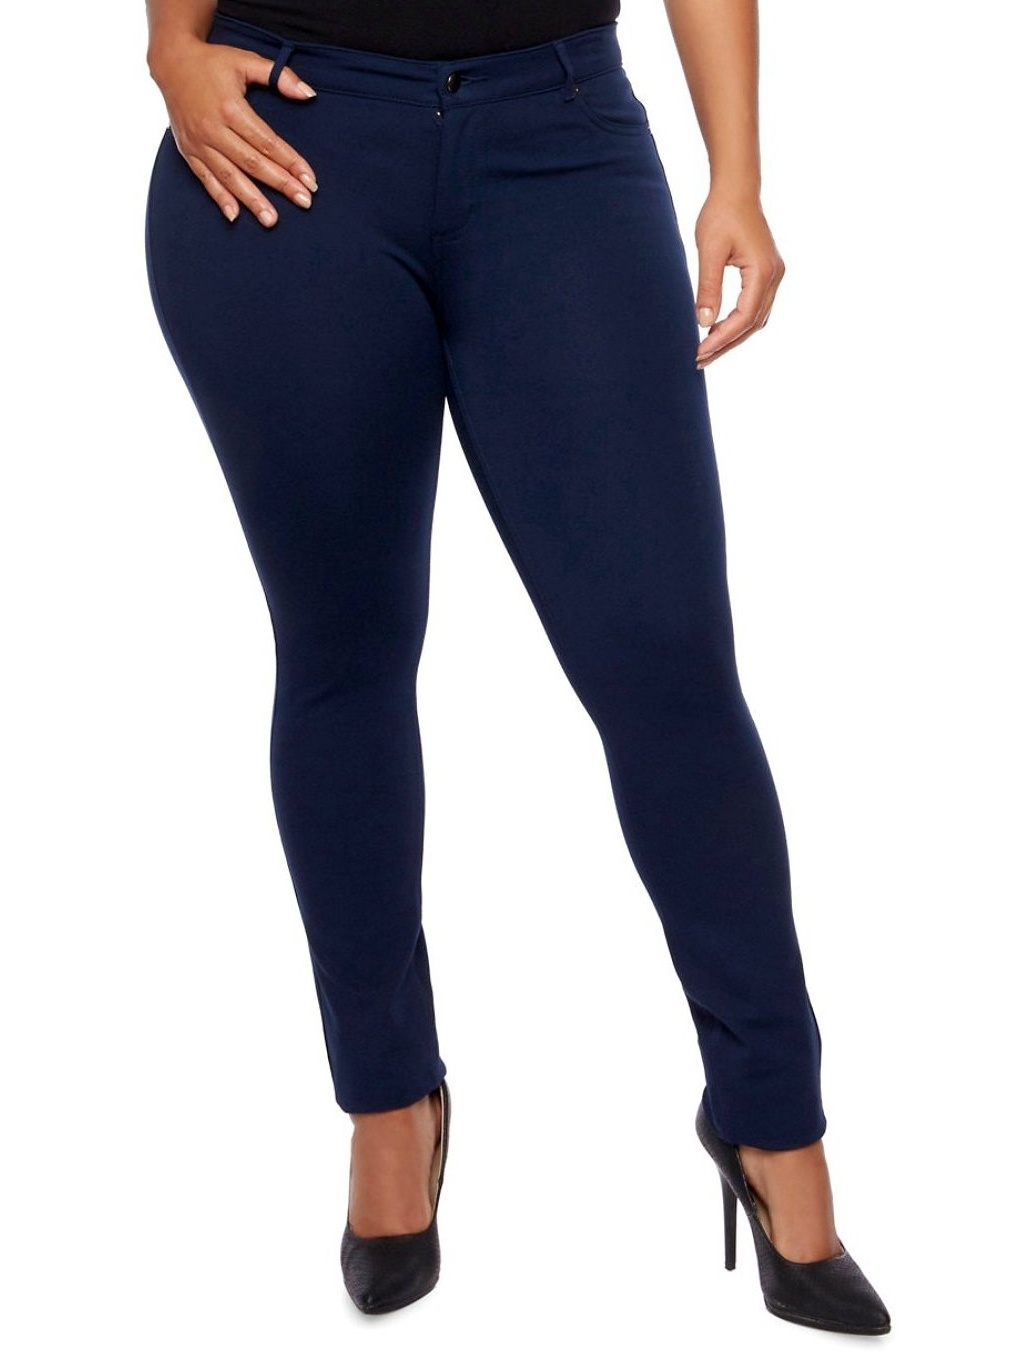 1826 Jeans Women's Plus Size Moleton Pants Cotton French Terry Plus Size